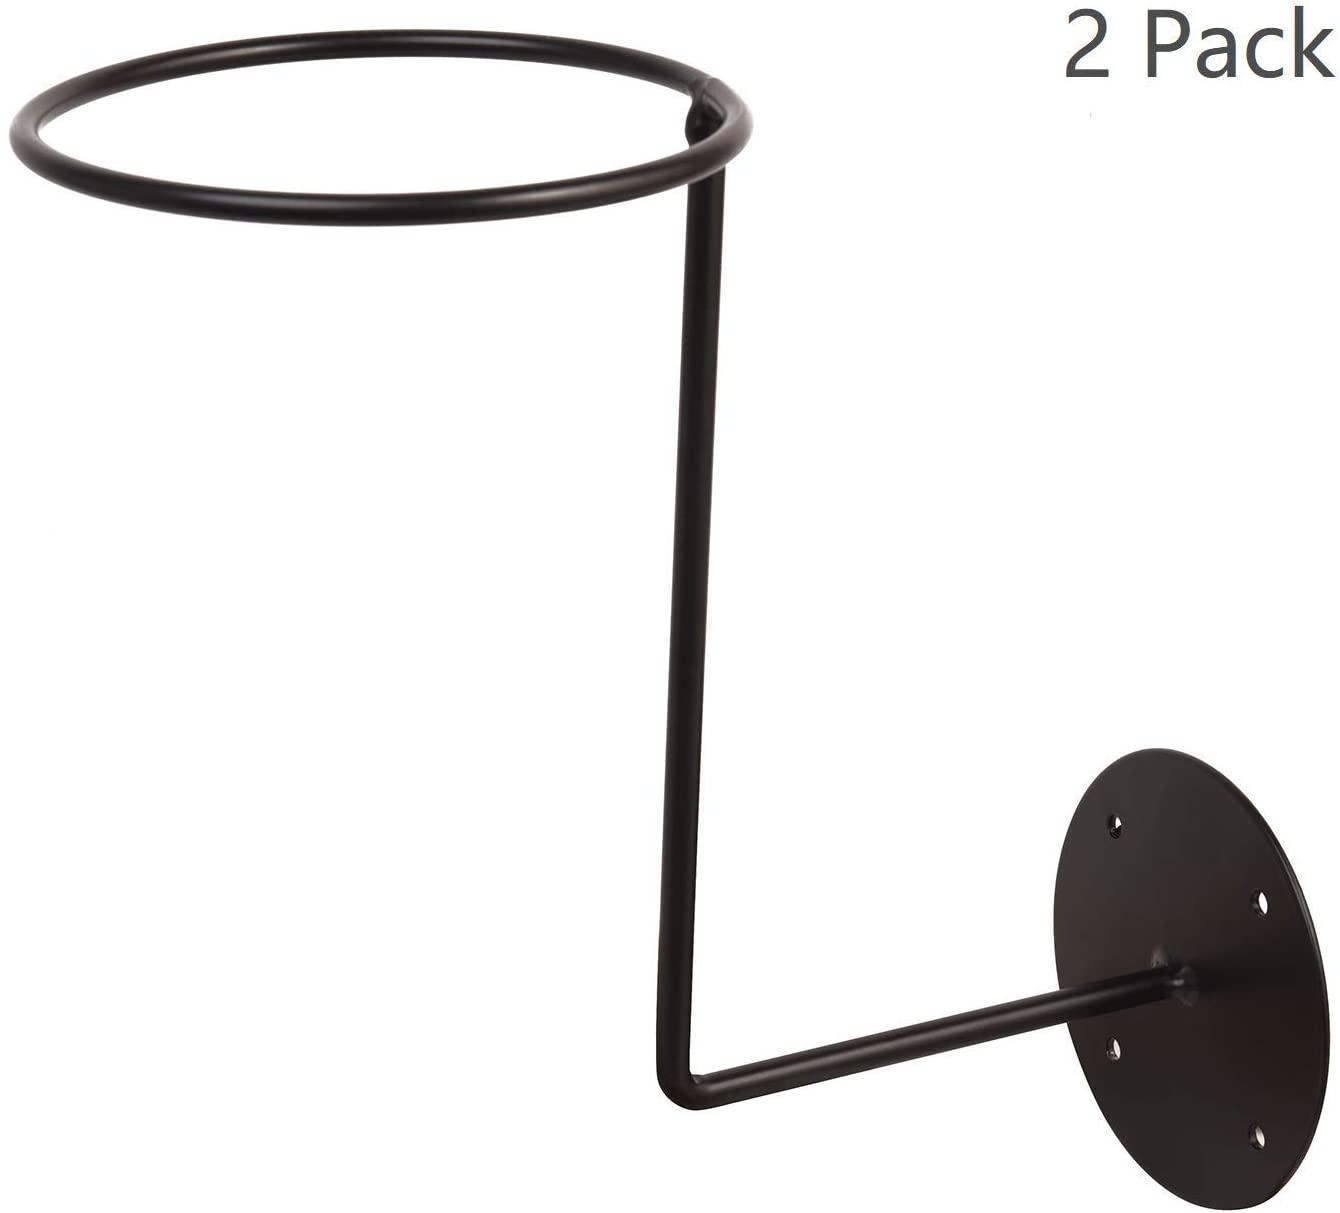 Motorcycle Accessories Helmet Holder Jacket Coats Hats Hanger Wall Mounted Multifunctional Rack Black 2 Pack